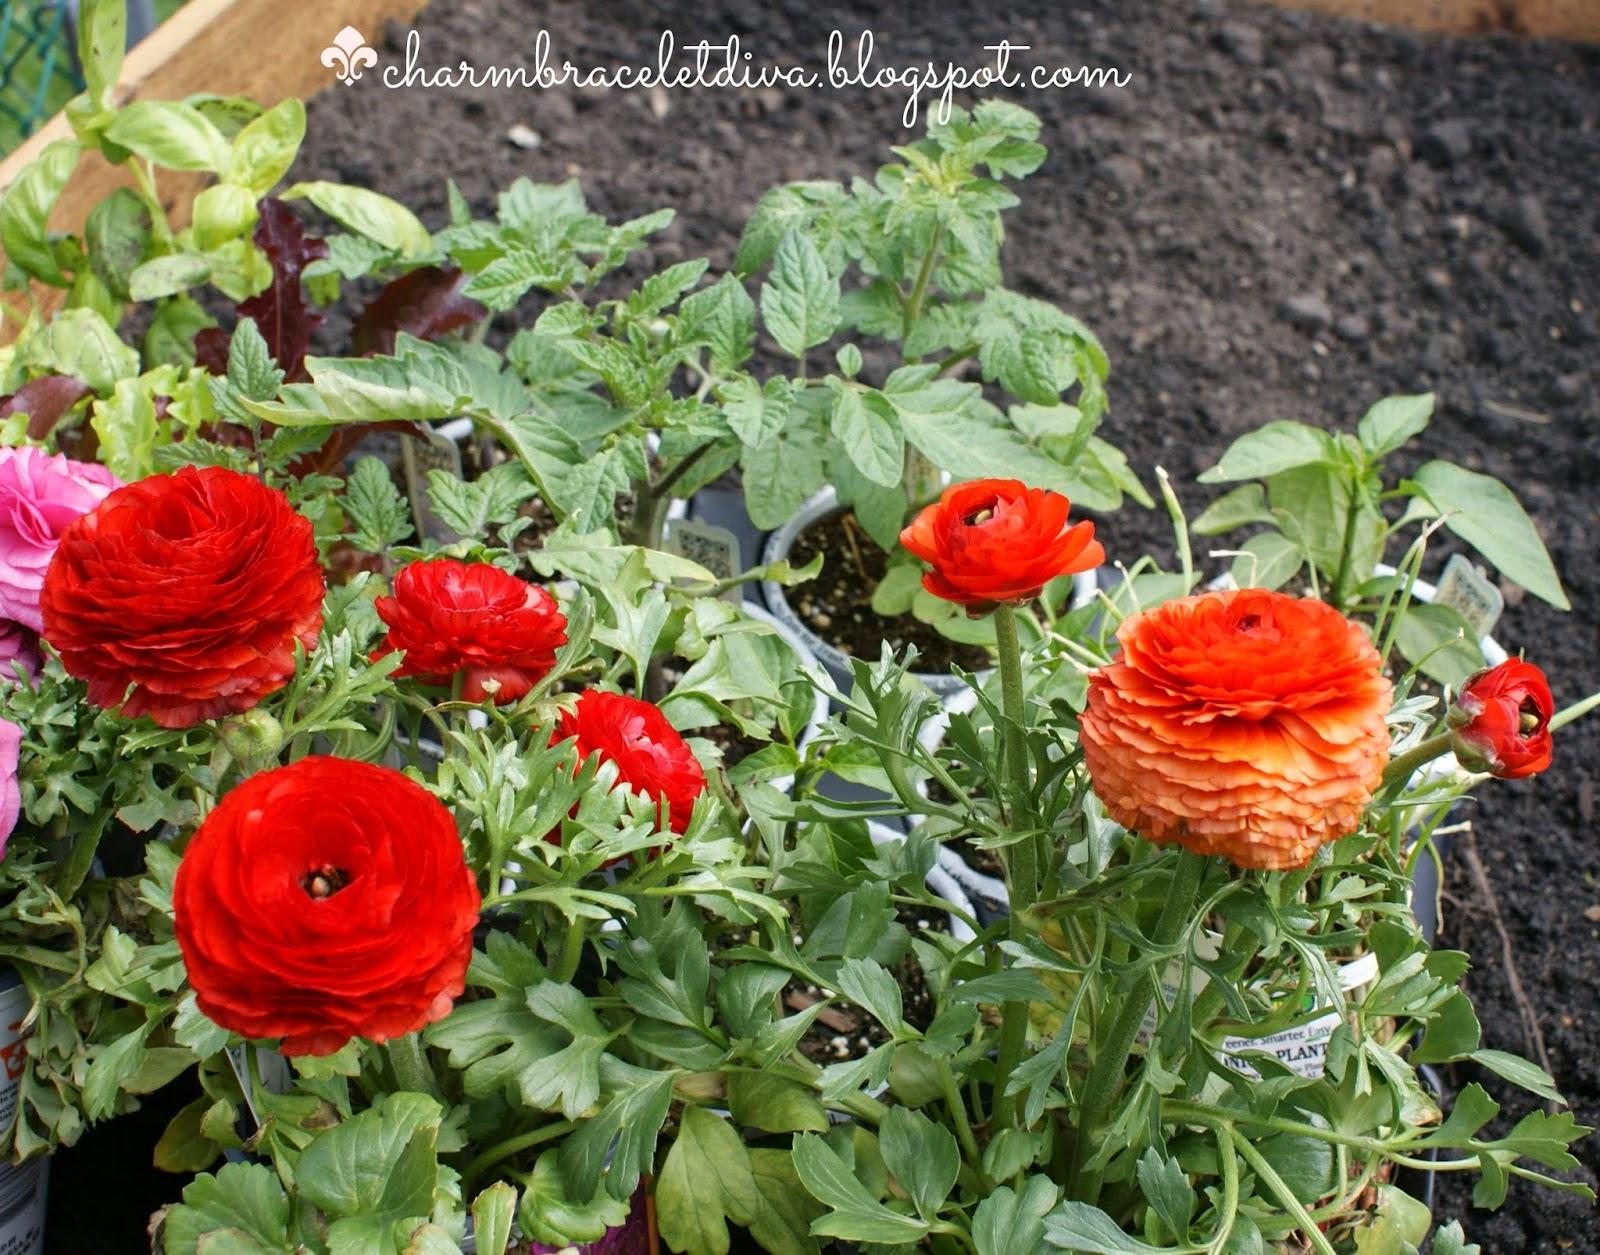 pink, red and orange garden ranunculas